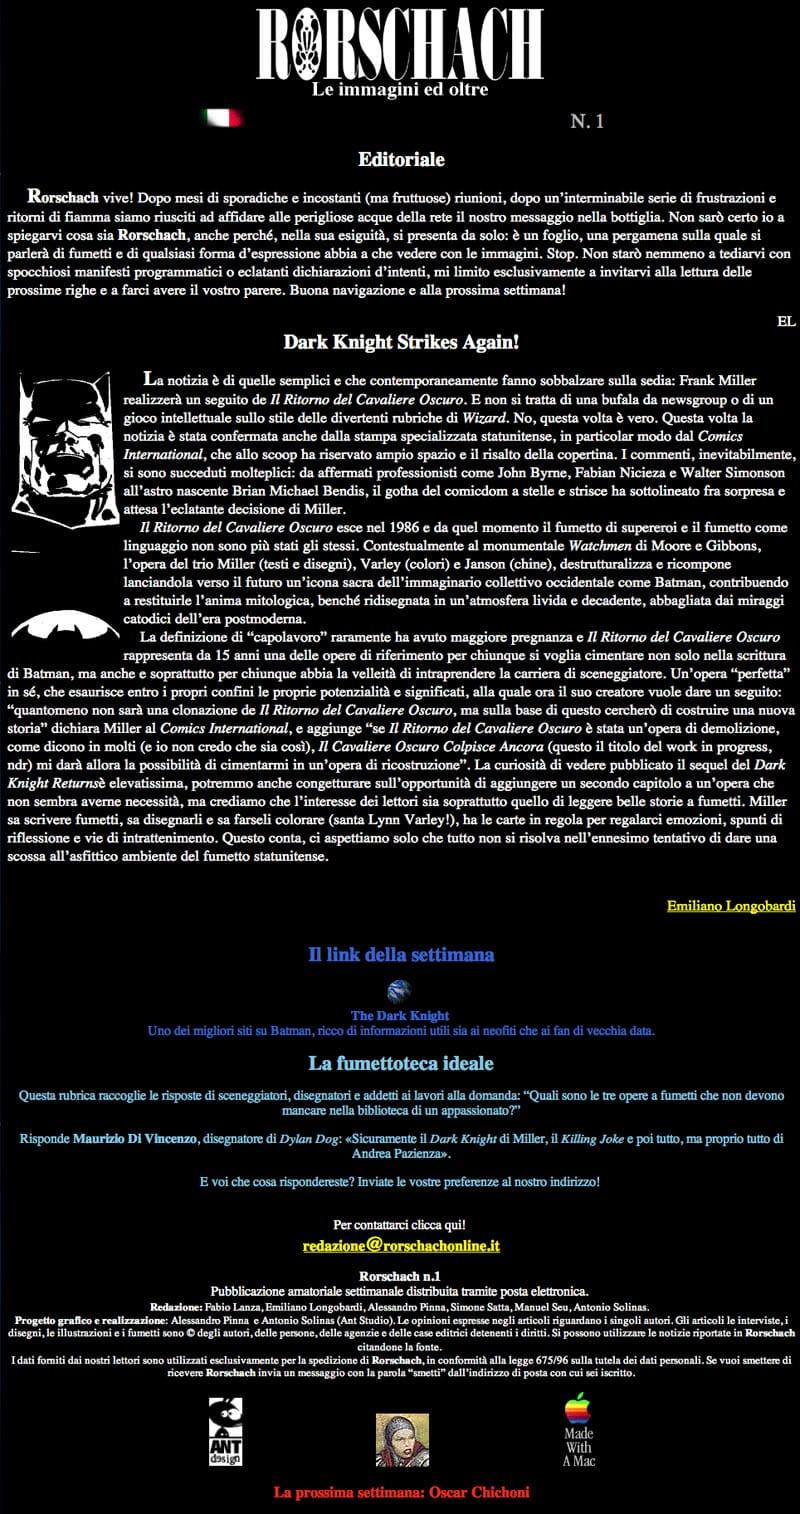 rorschach01_Approfondimenti